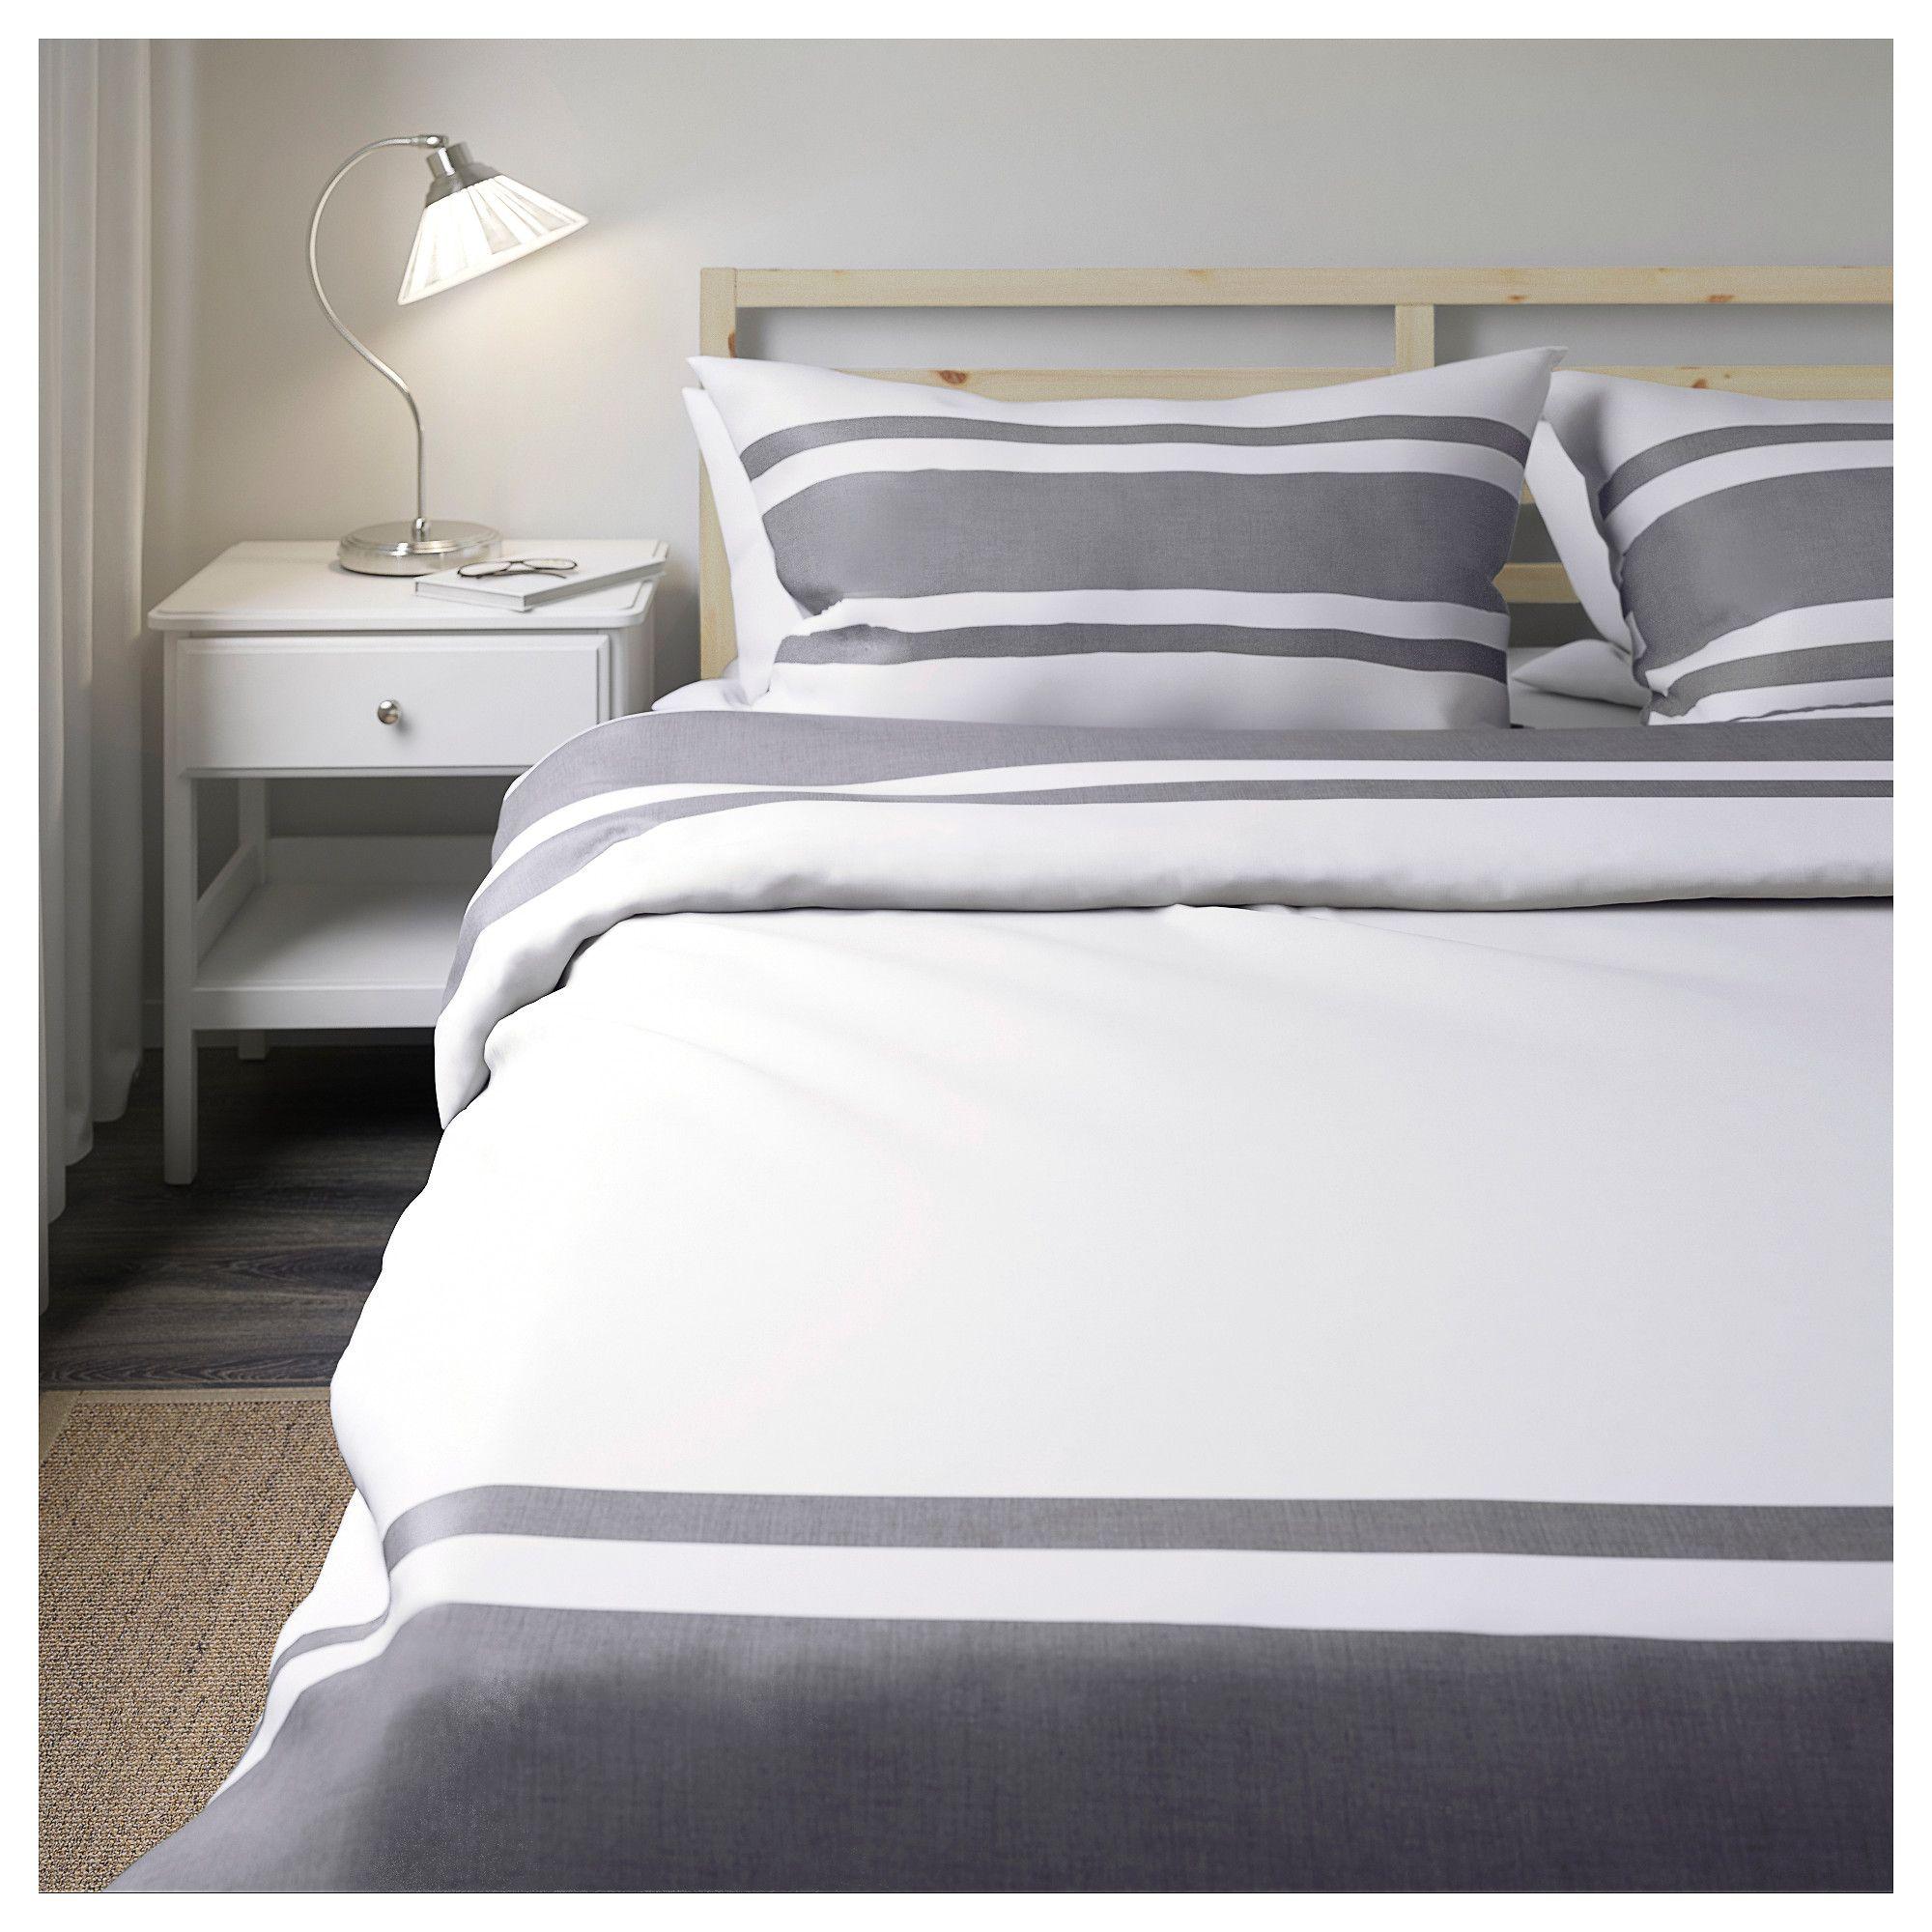 Furniture And Home Furnishings Duvet Cover Master Bedroom Black